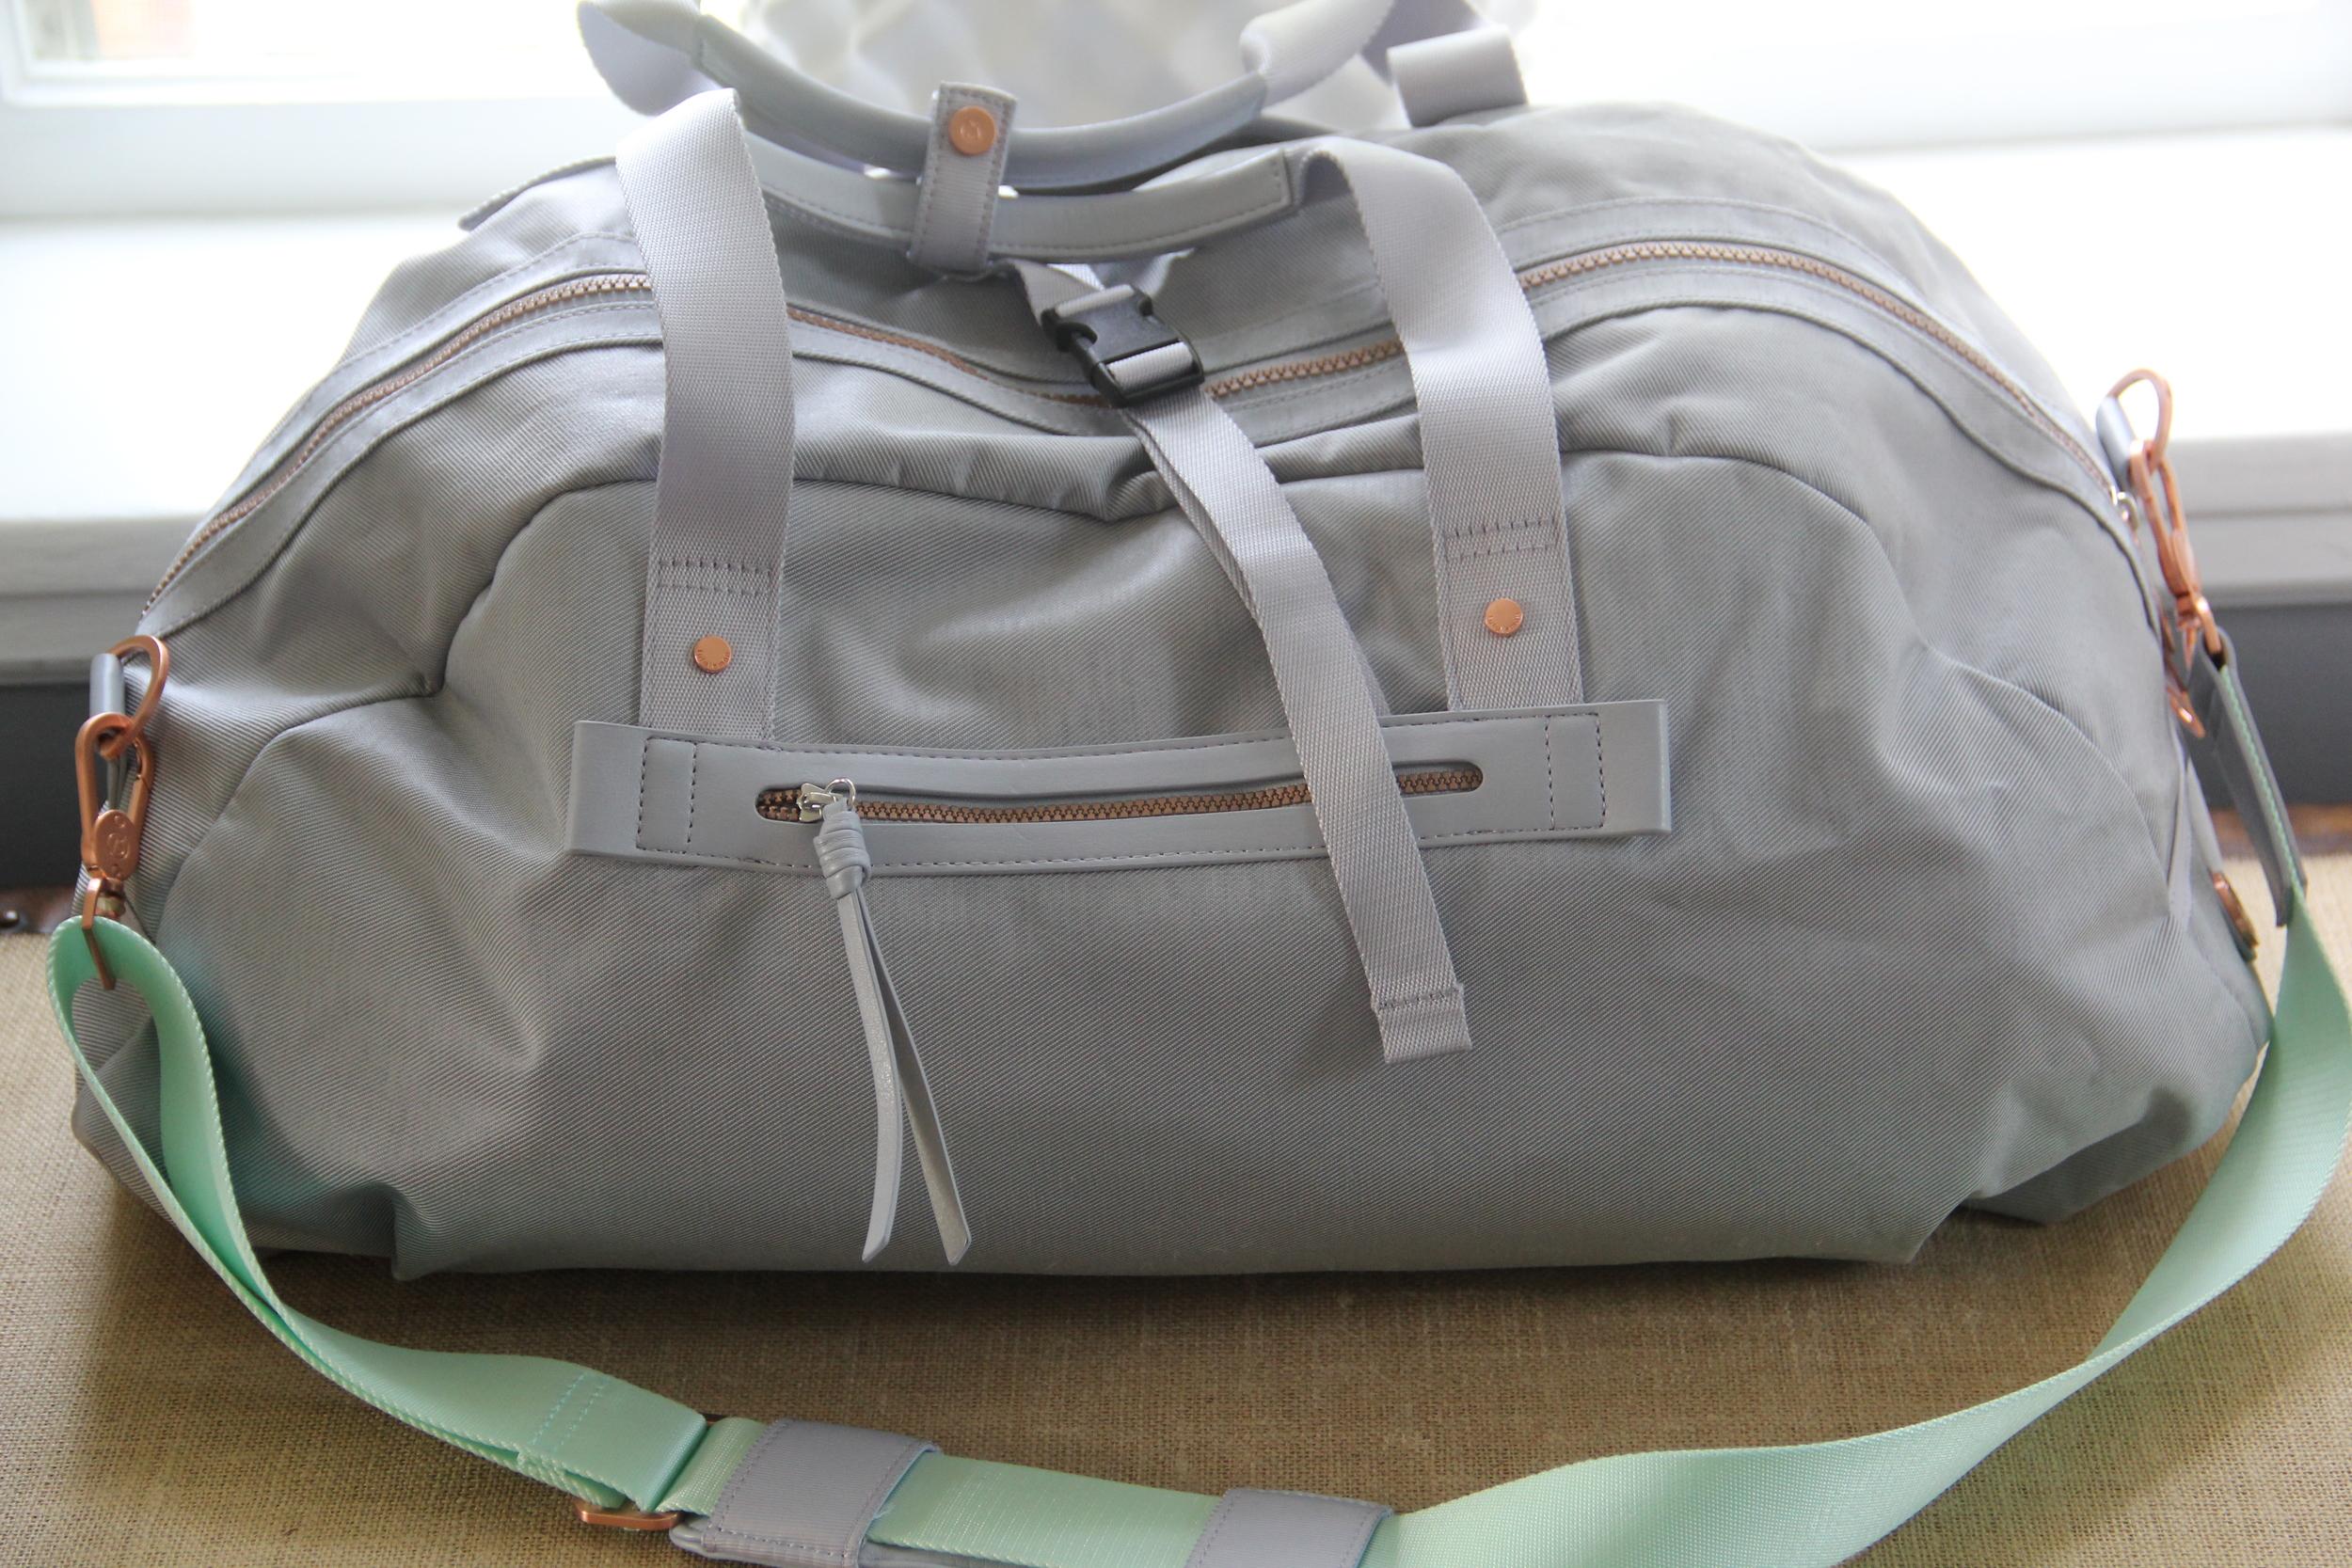 Lululemon Duffle Bag.JPG